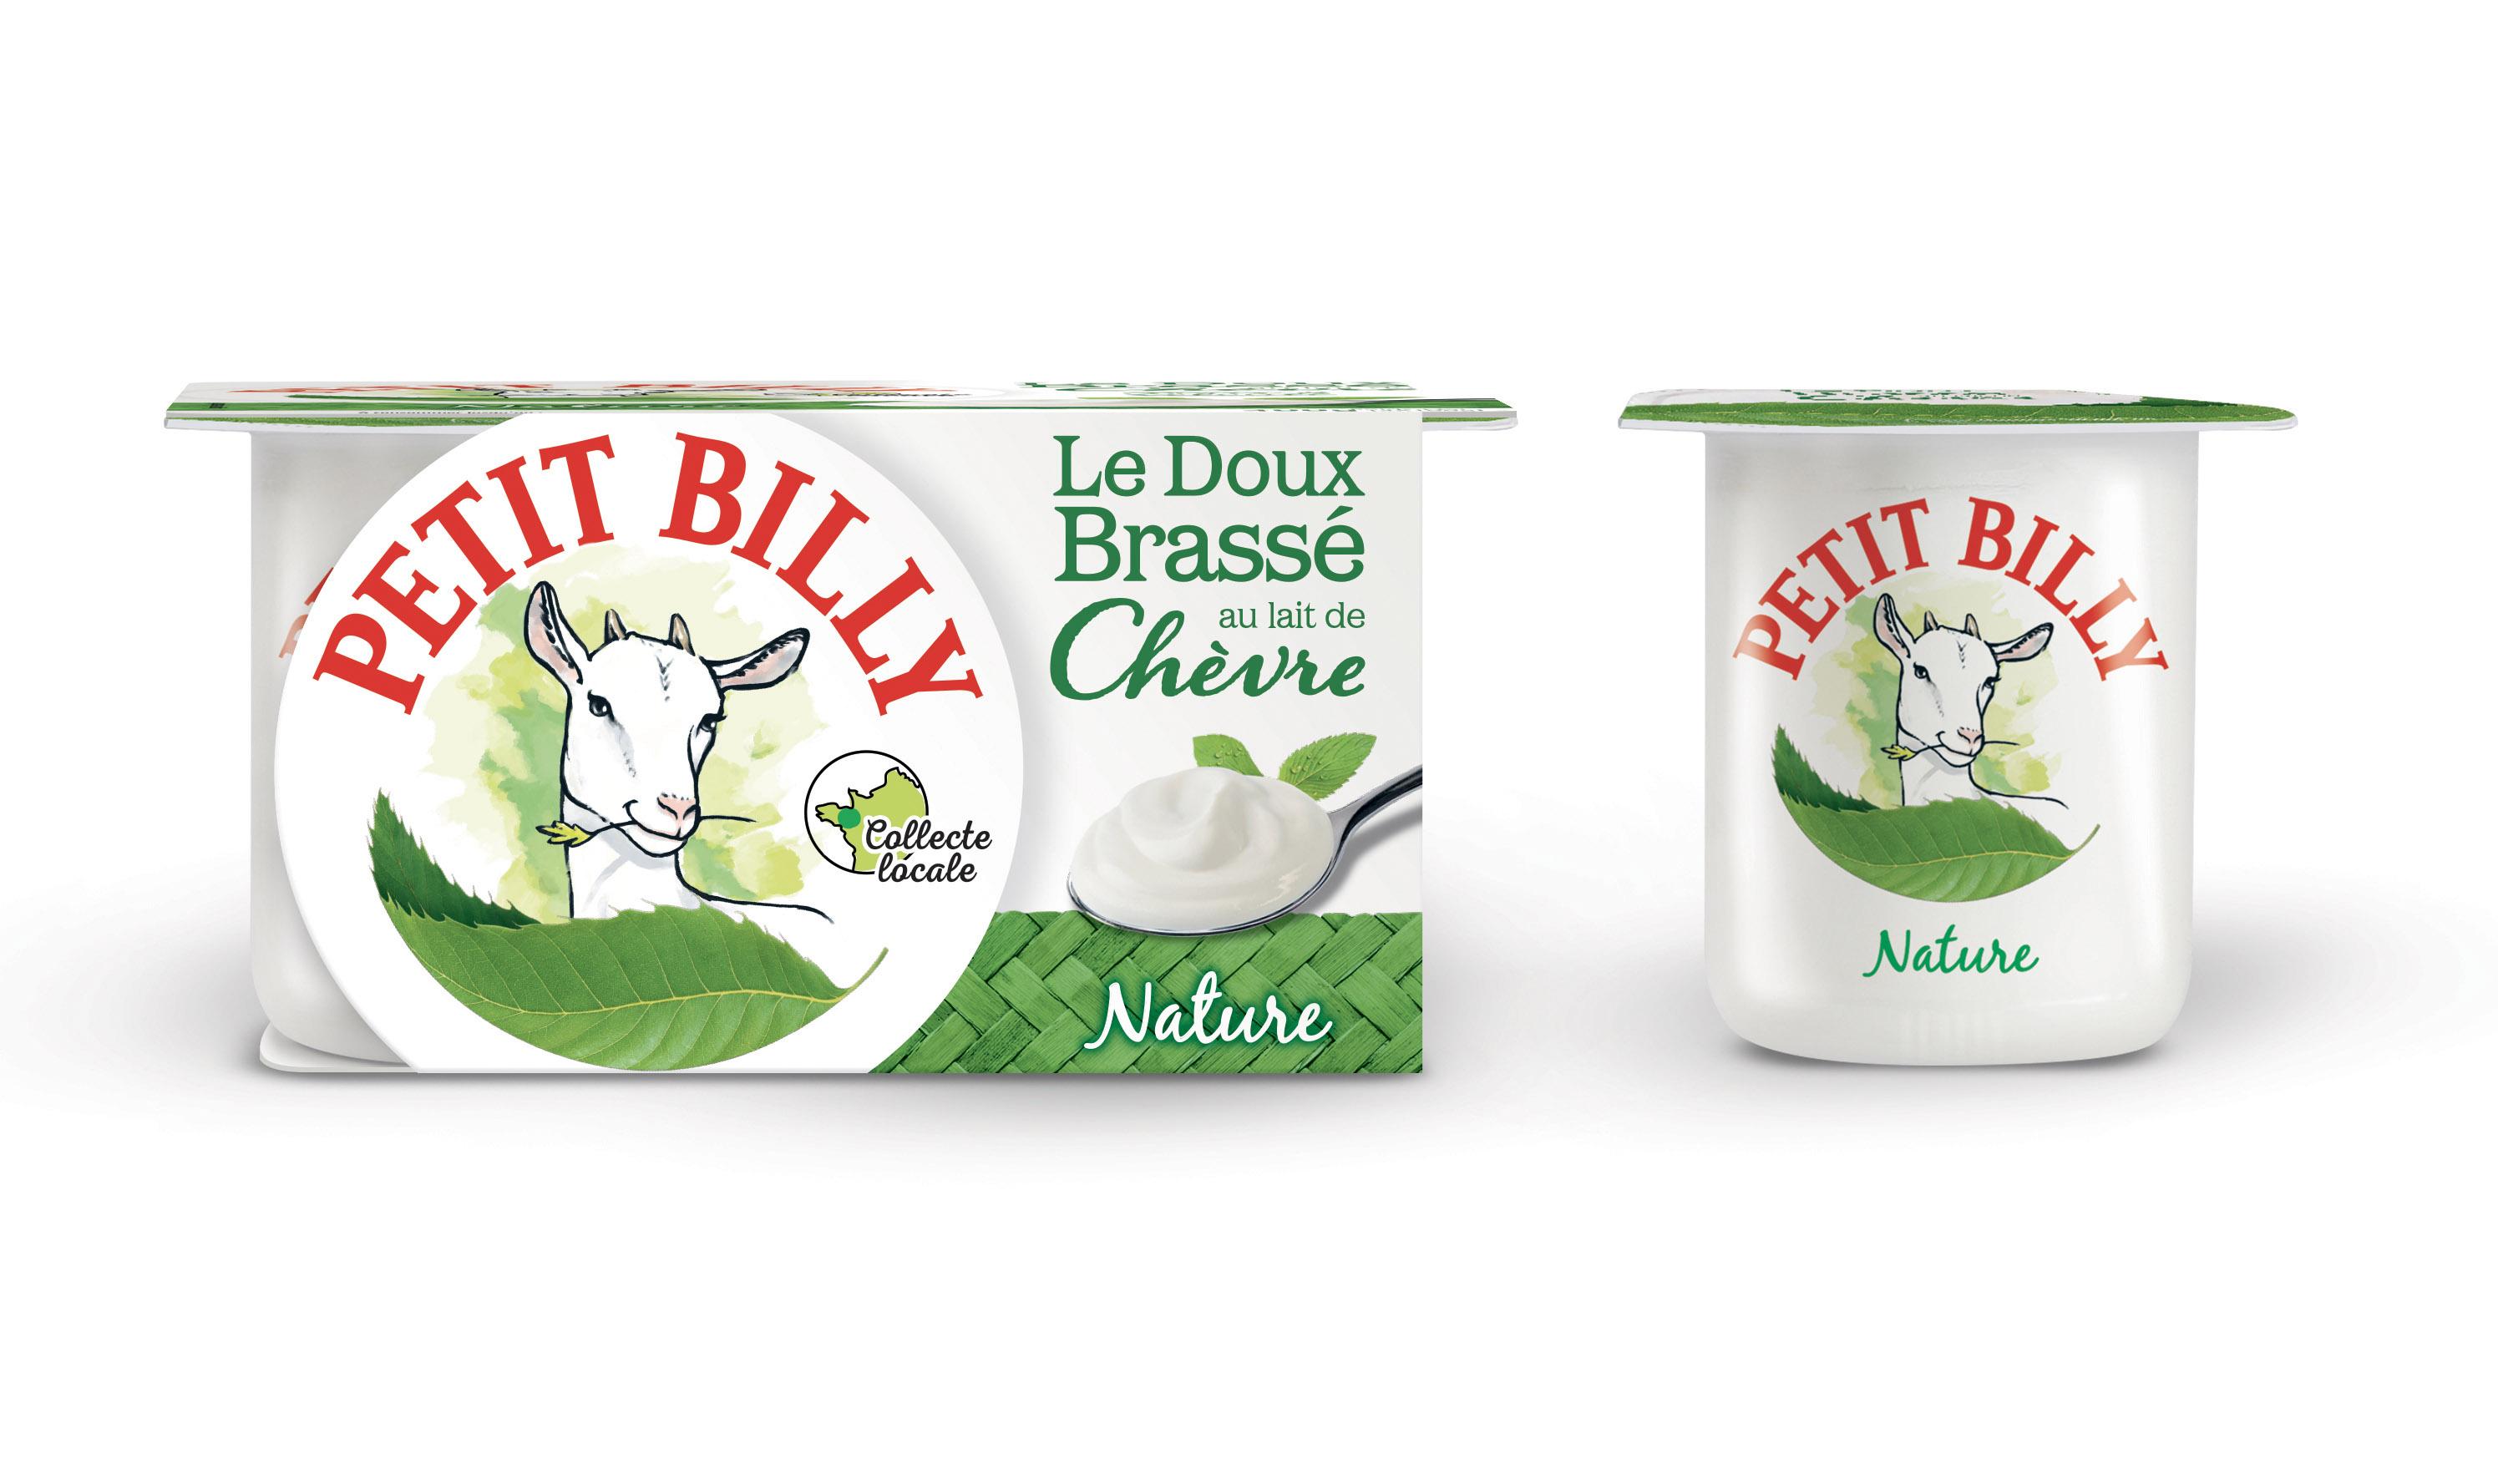 Doux-Brasse-Petit-Billy-Graphemes-RVB2